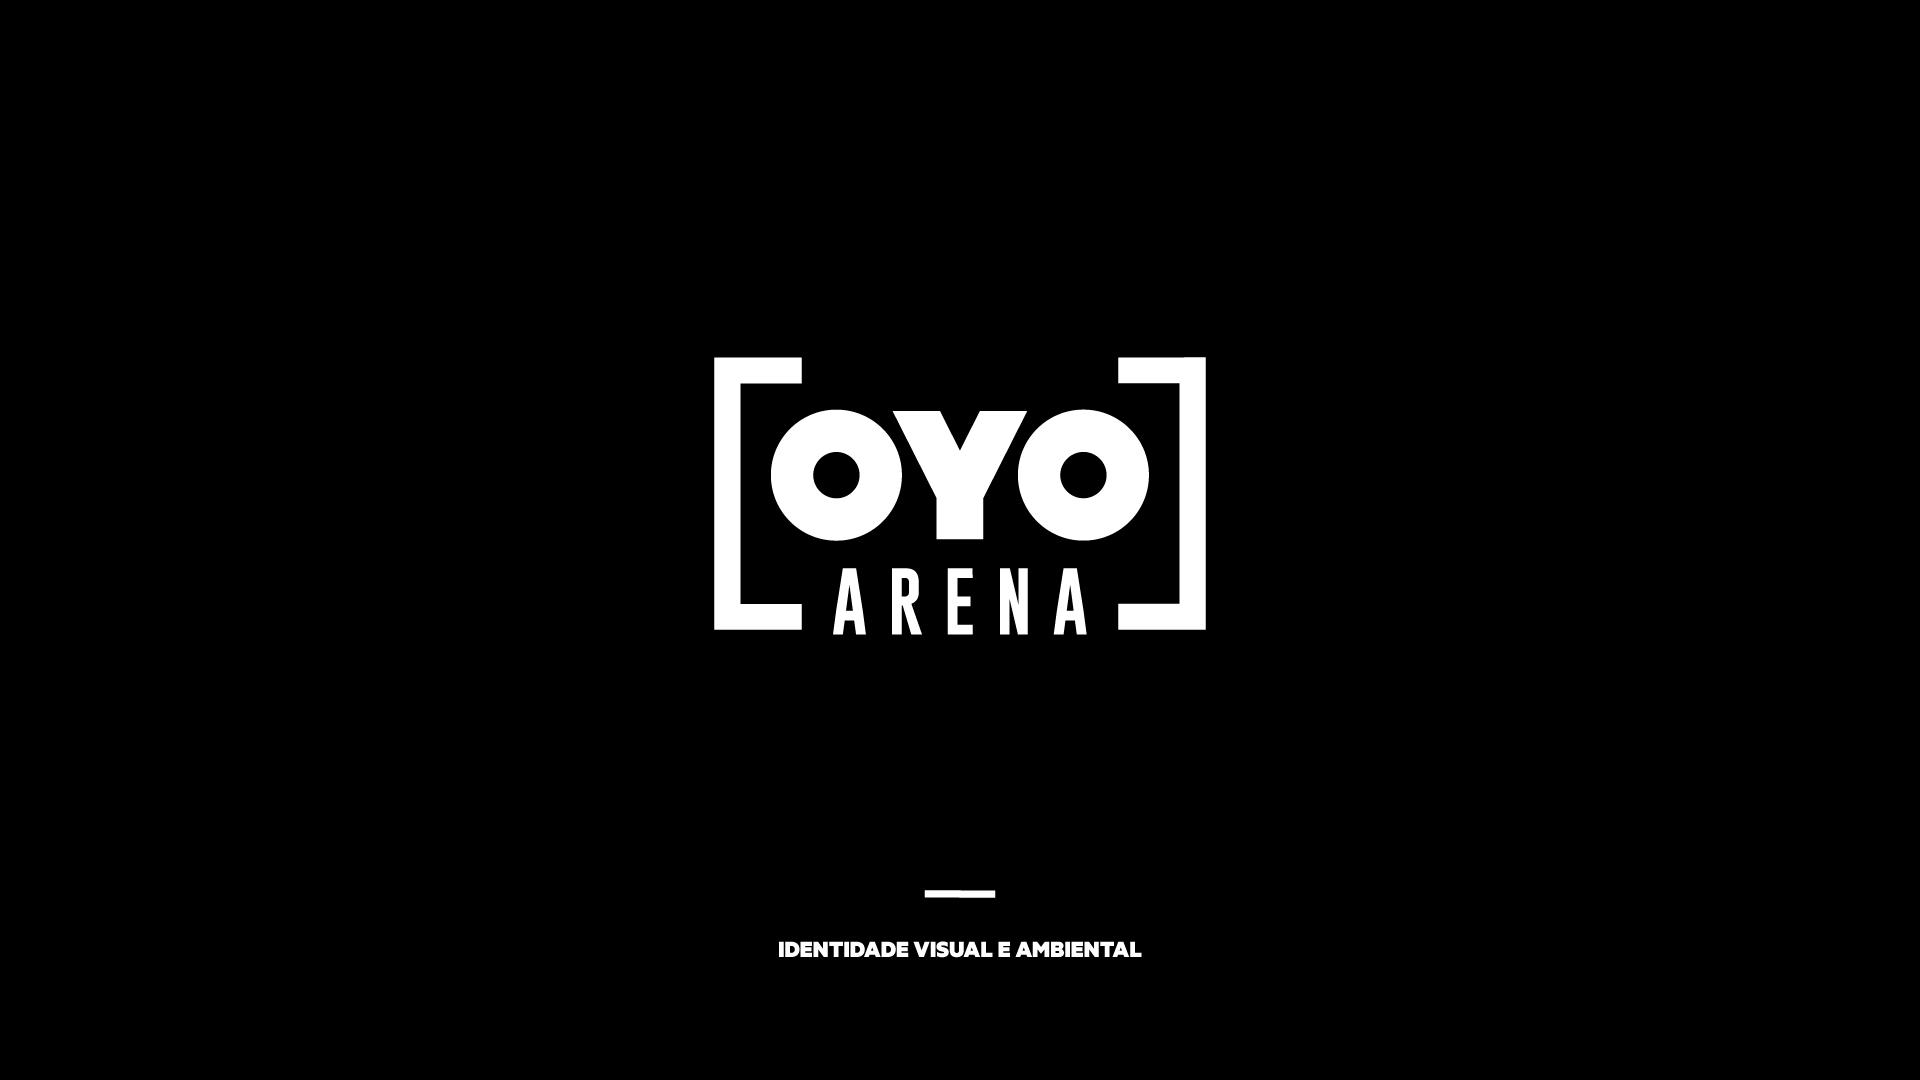 OYO Arena